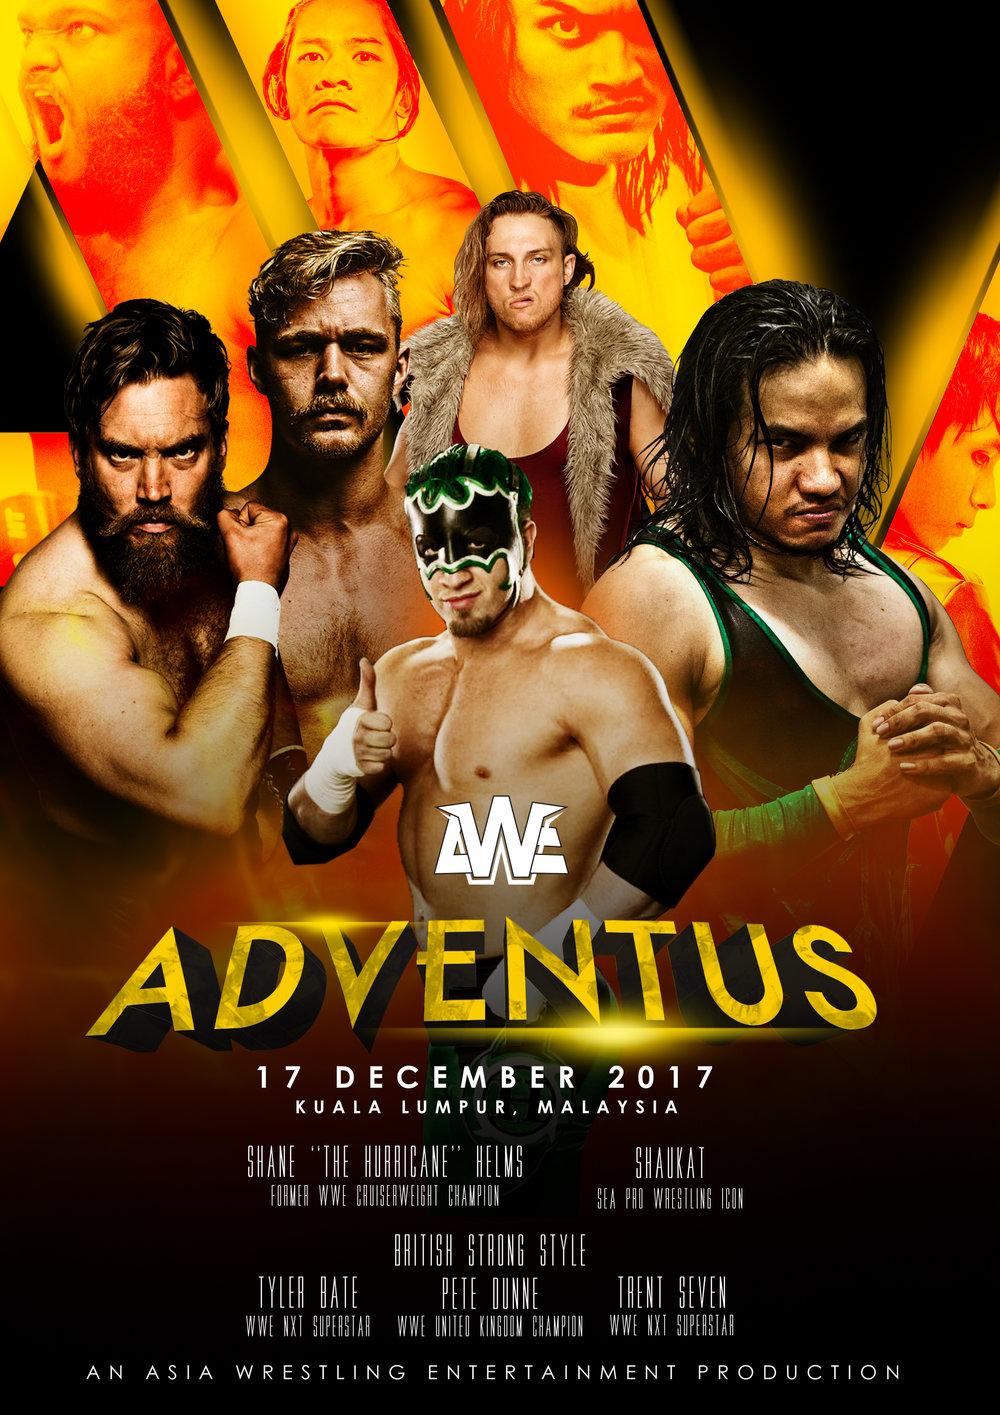 AWE_Adventus_Poster_20171127.jpg